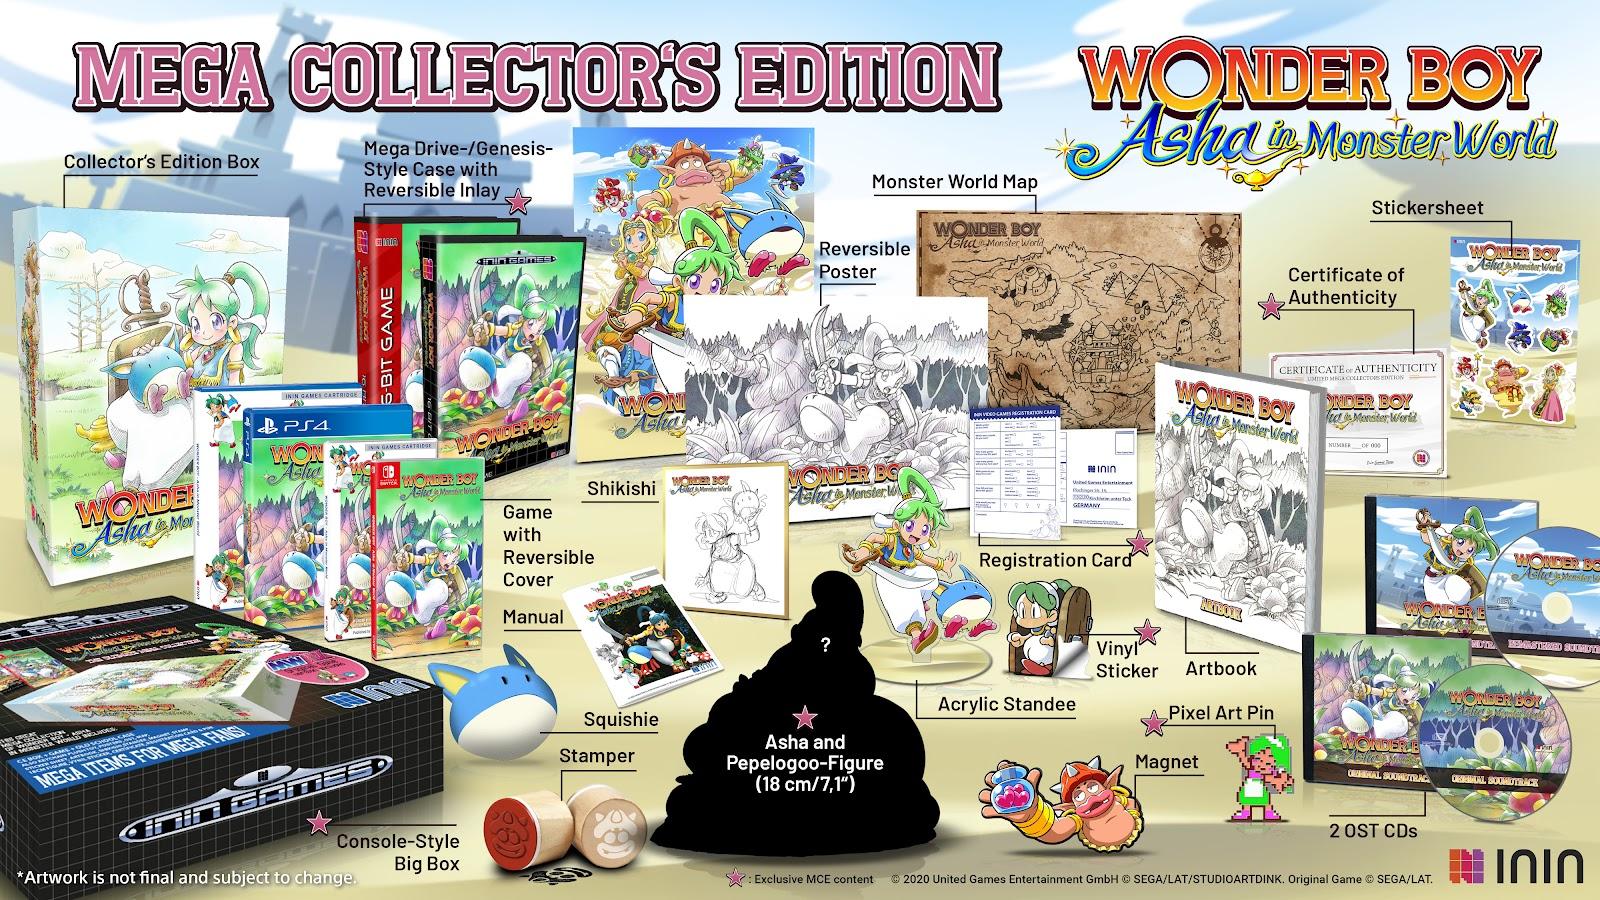 Wonder Boy Asha in Monster World Mail?url=https%3A%2F%2Flh4.googleusercontent